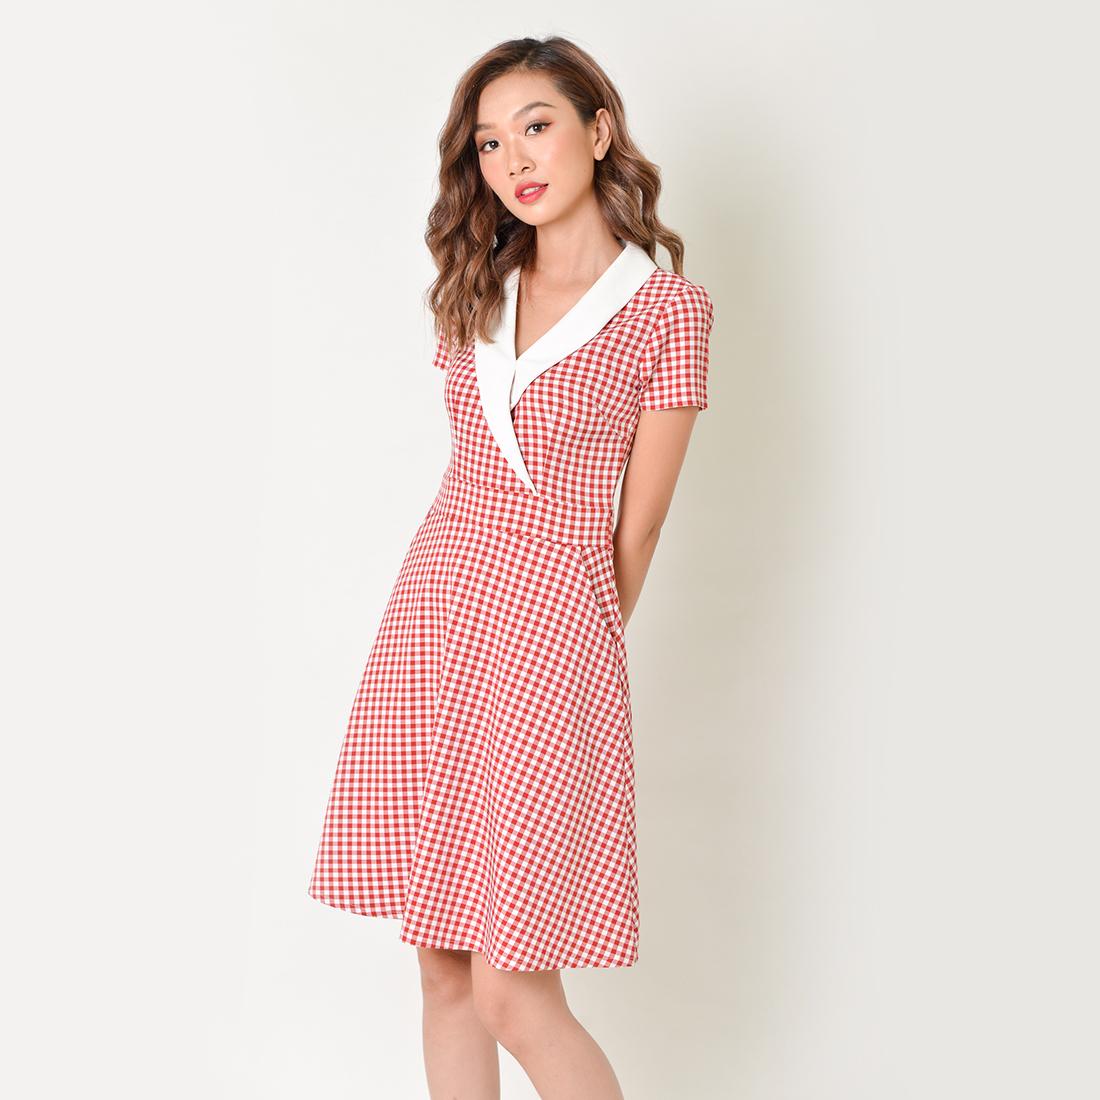 Đầm chữ A thời trang Eden caro cổ vest – D339